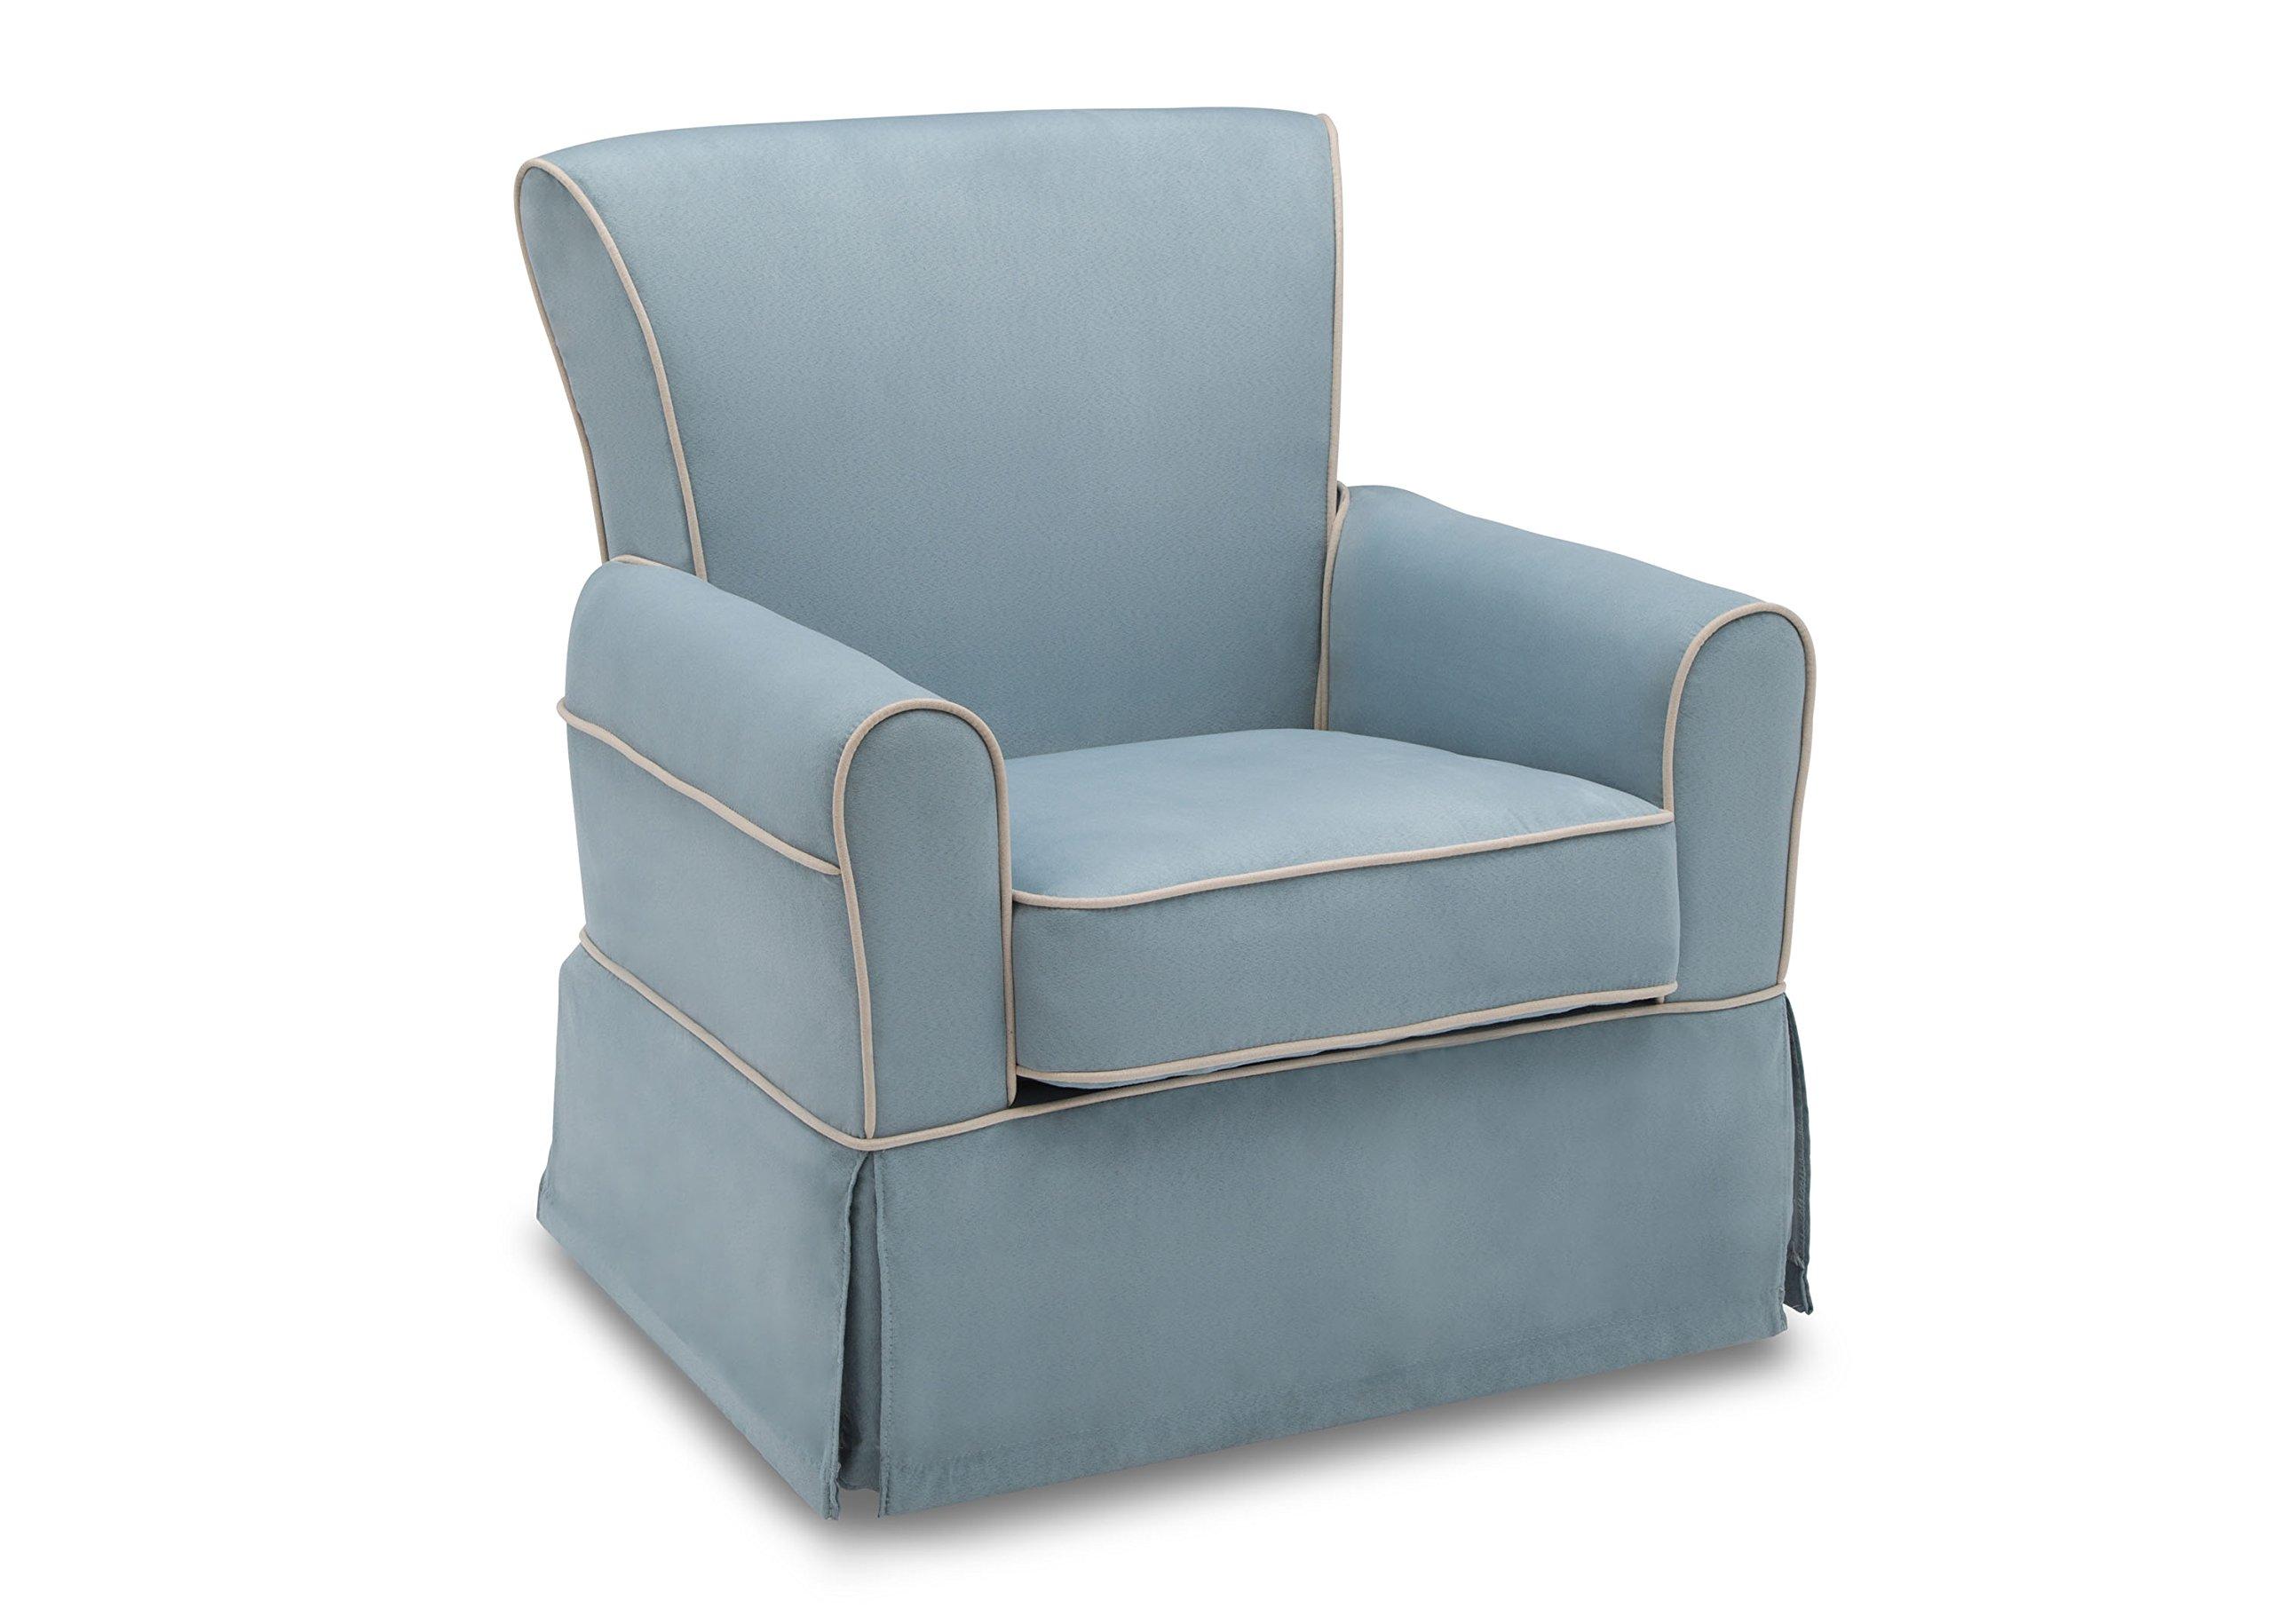 Delta Furniture Benbridge Upholstered Glider Swivel Rocker Chair, Frozen Blue with Cream Welt by Delta Furniture (Image #3)